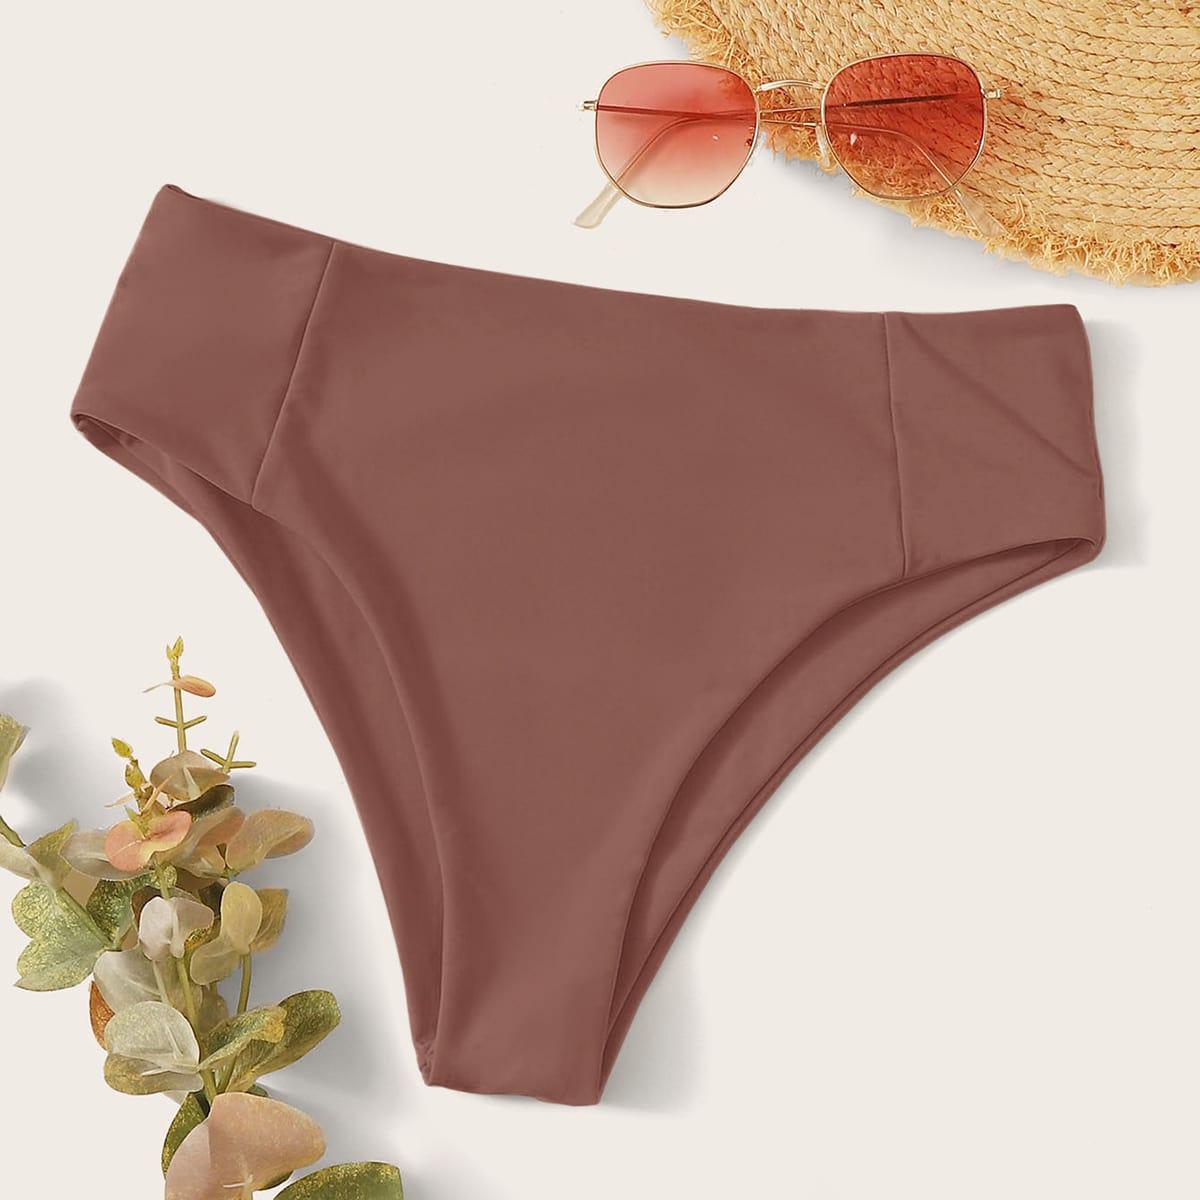 shein Hoog getailleerde bikinipanty